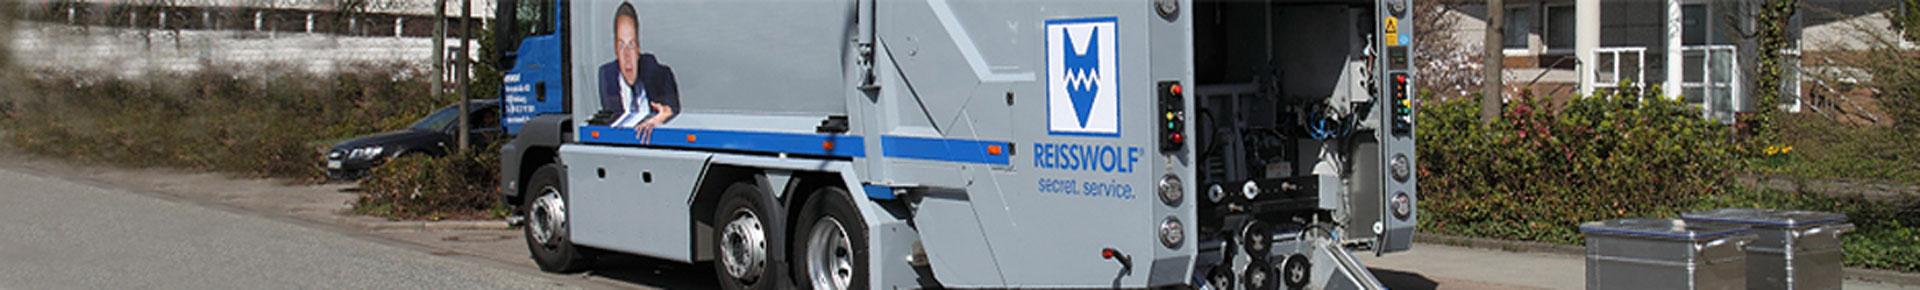 A Reisswolf Budapest kft. begyüjtő kocsija